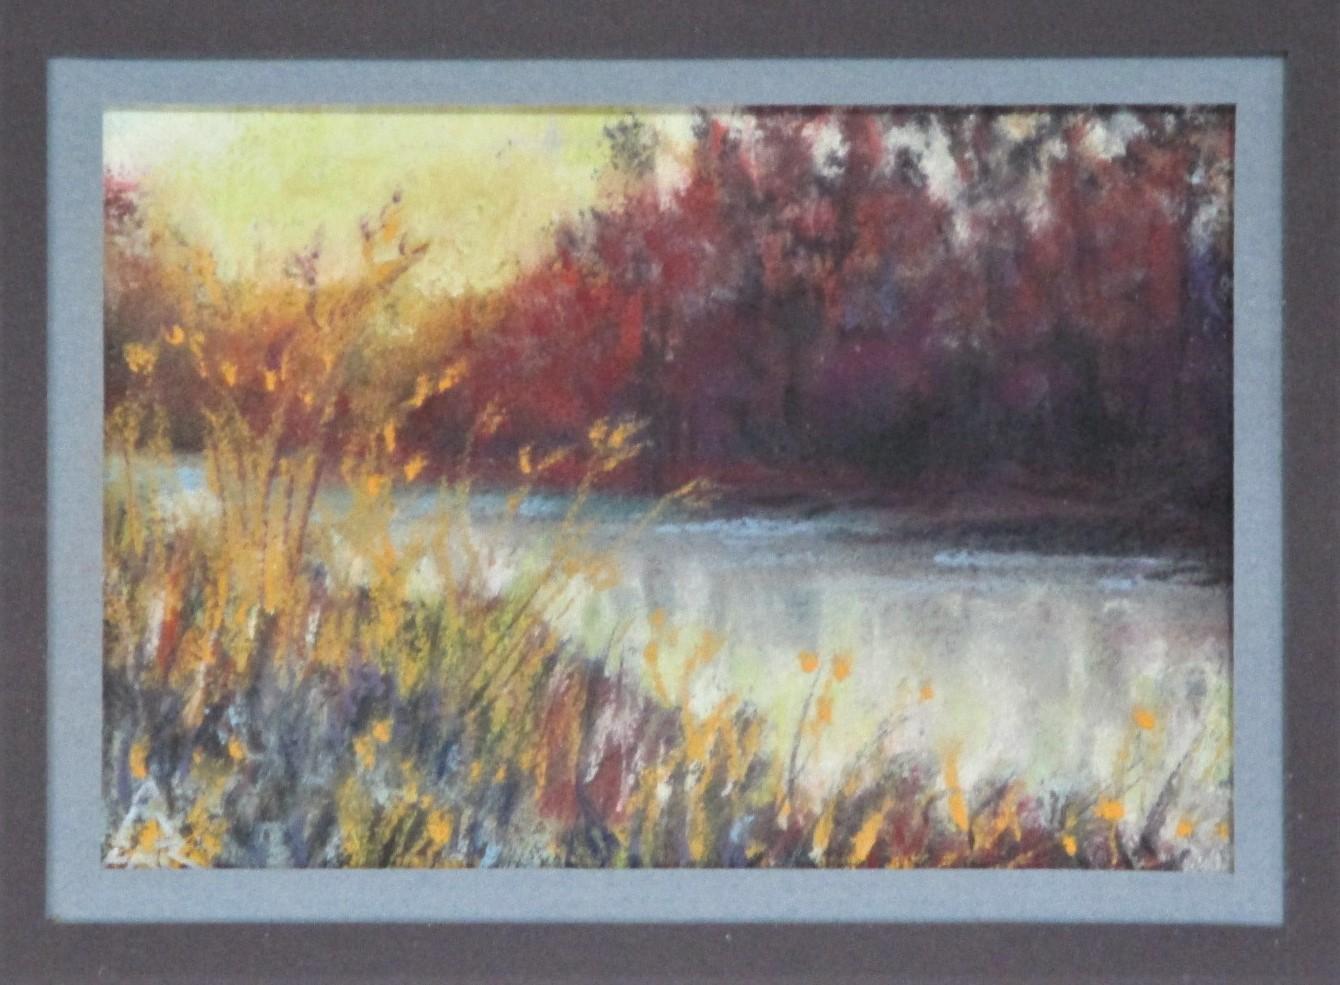 Sun Through Grass by  Andrea McFarland - Masterpiece Online